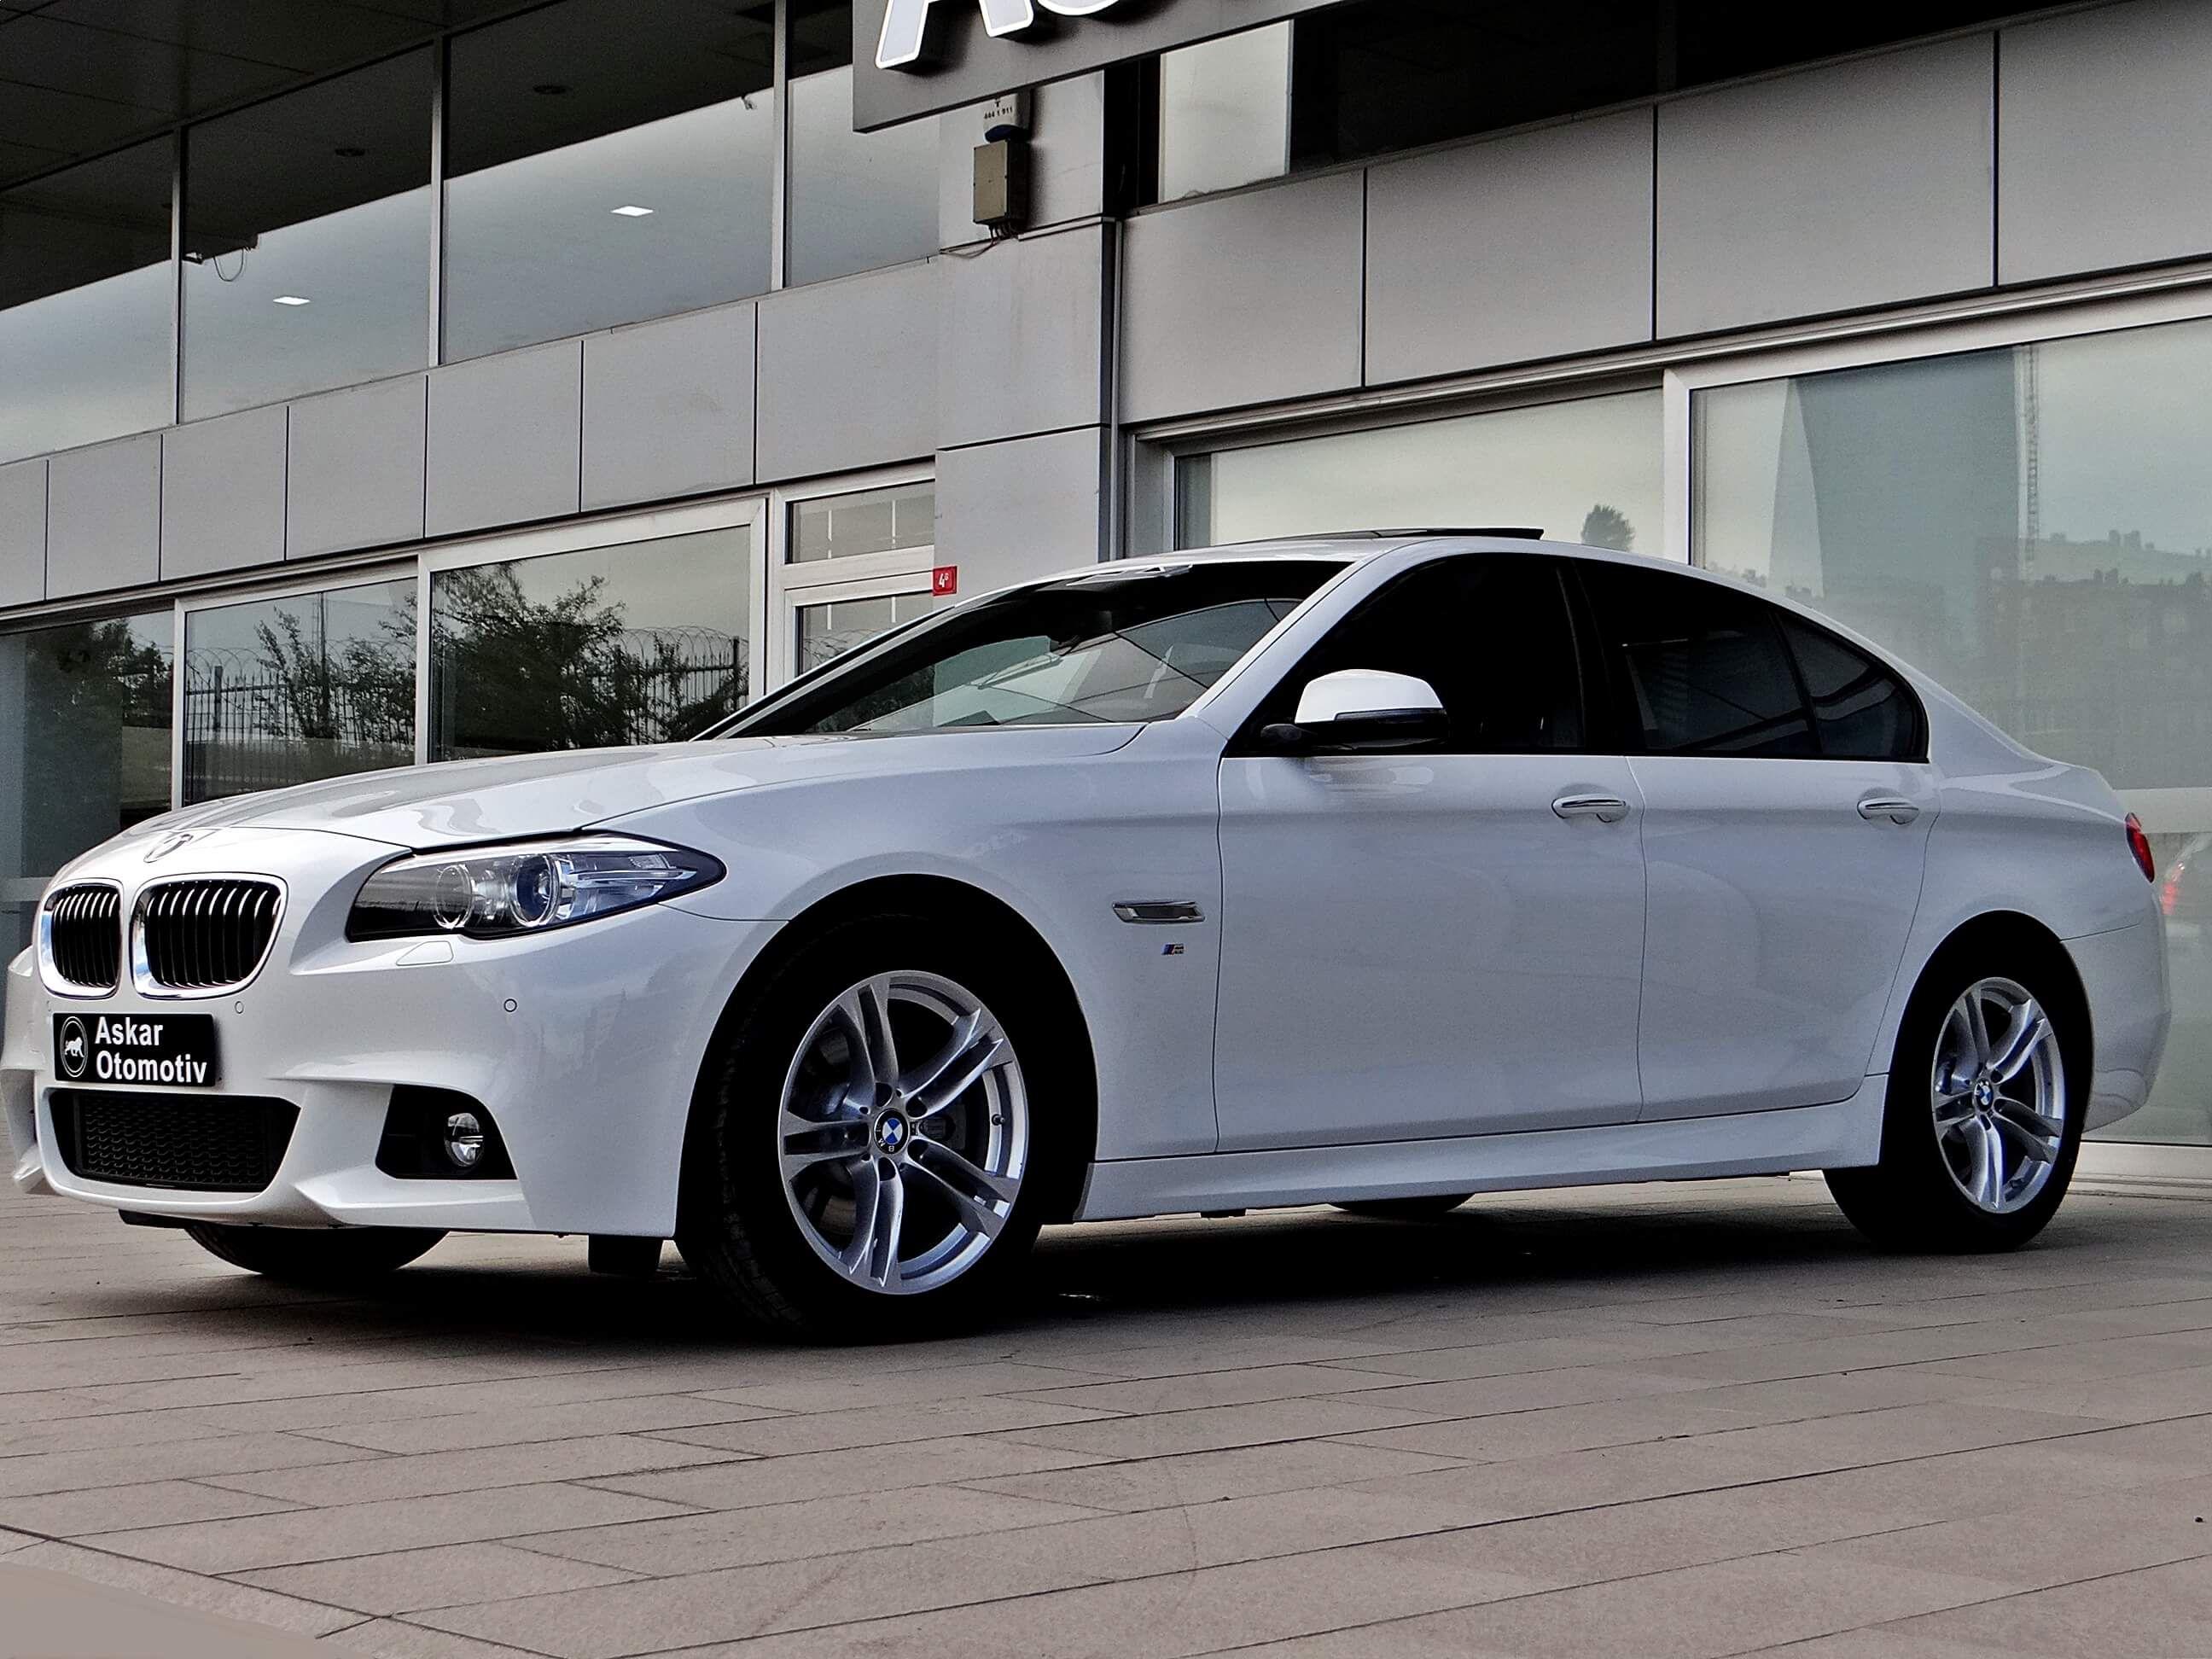 premium bu edition lease large sedans select of burn infiniti infinity drive luxury untouchable buy